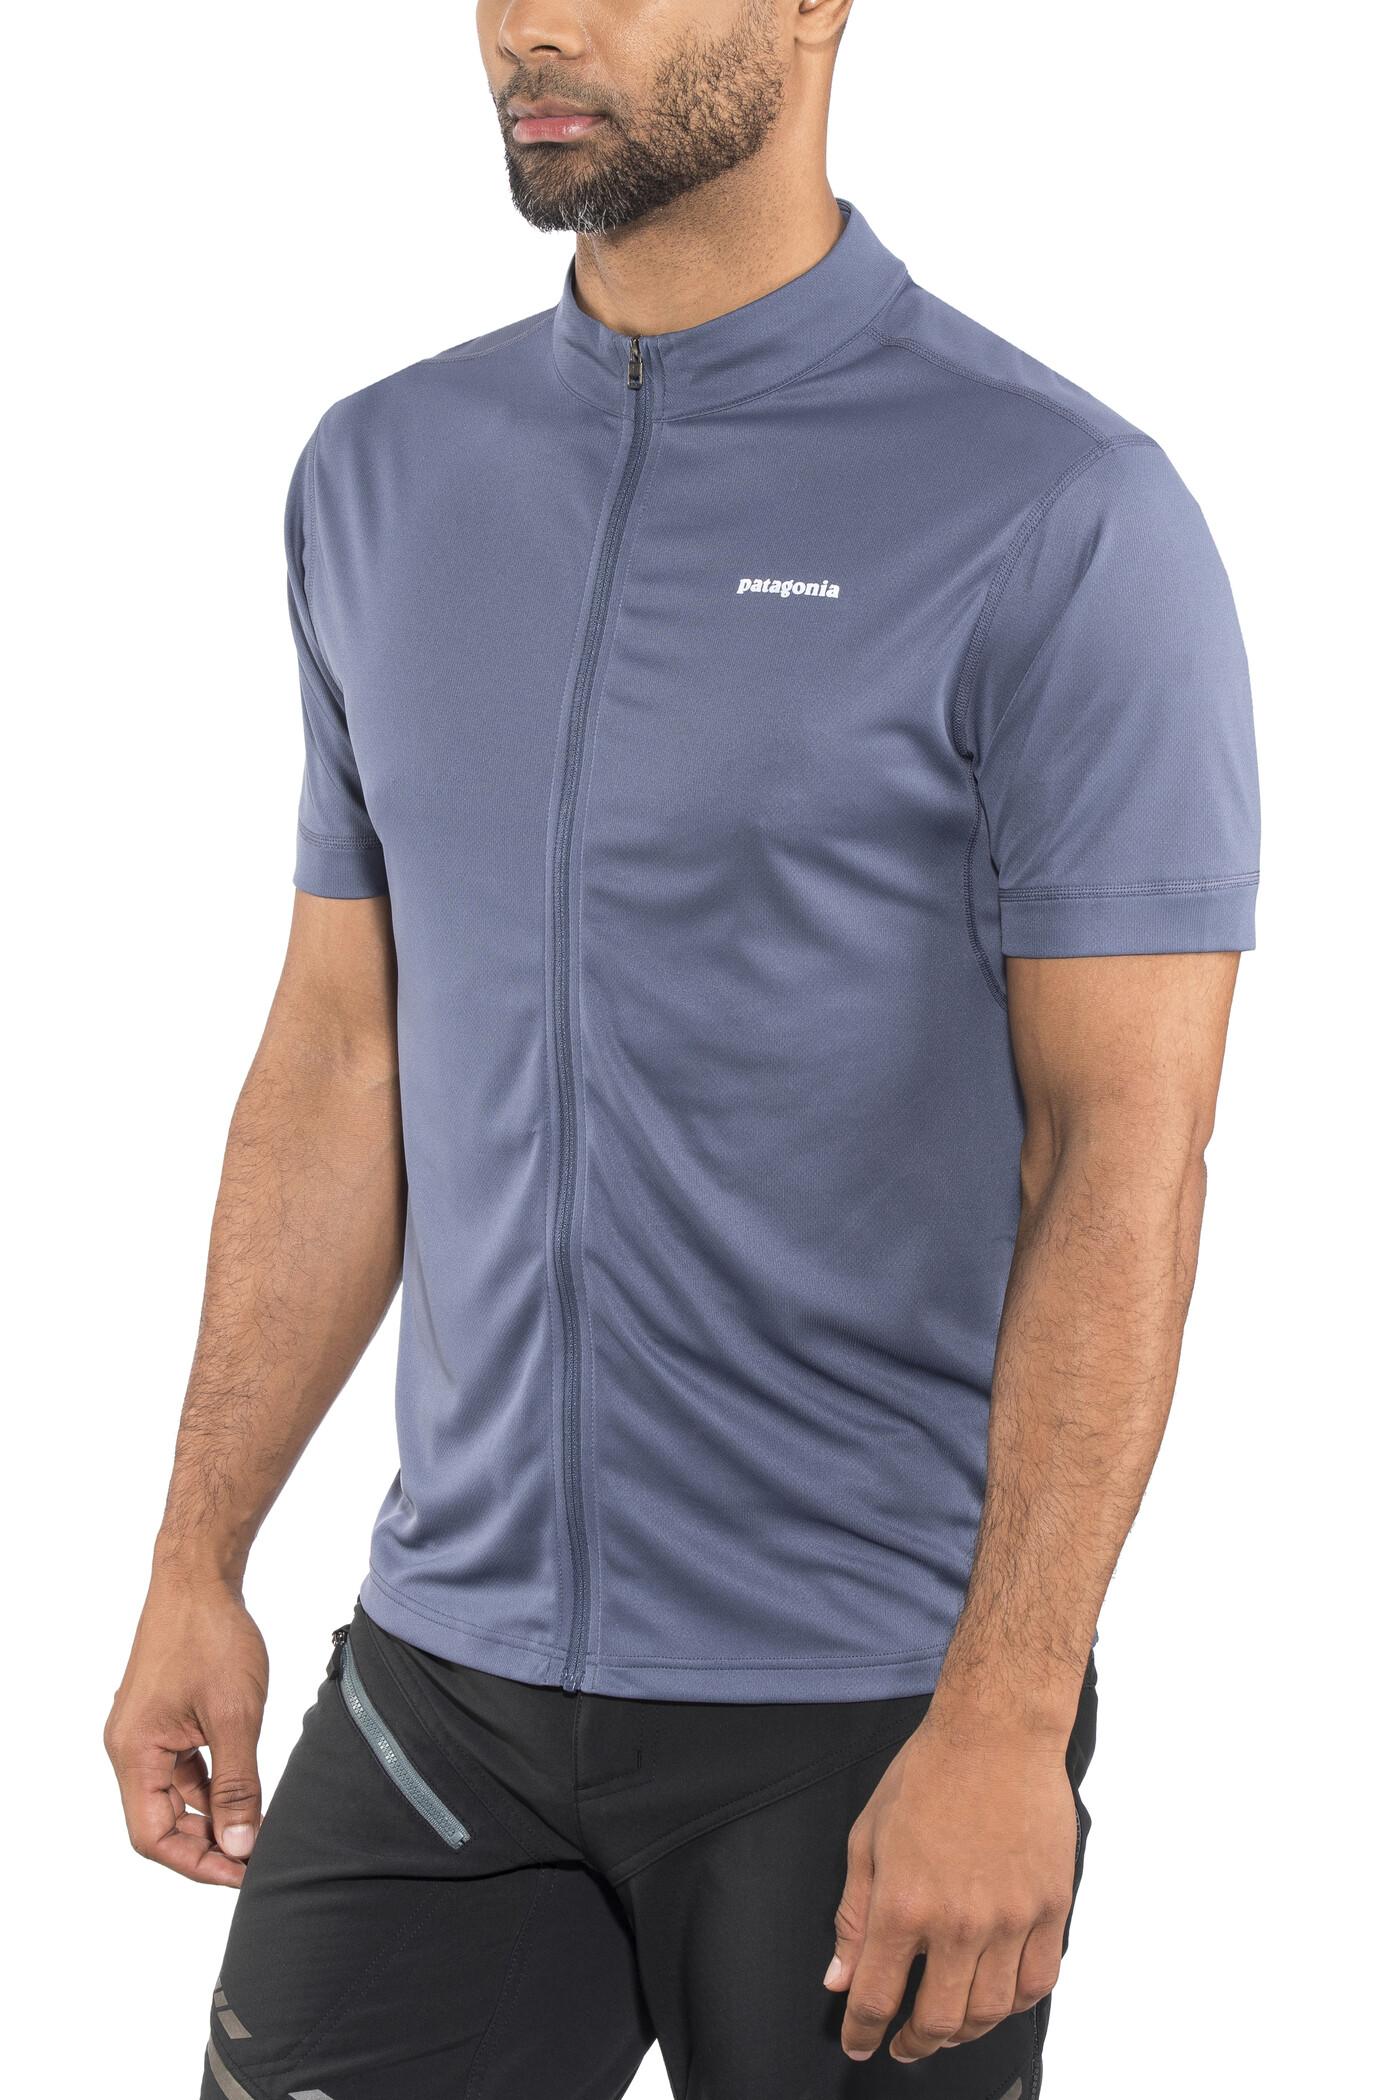 adidas Supernova Buddy Half Zip Brushed Shirt Langarm